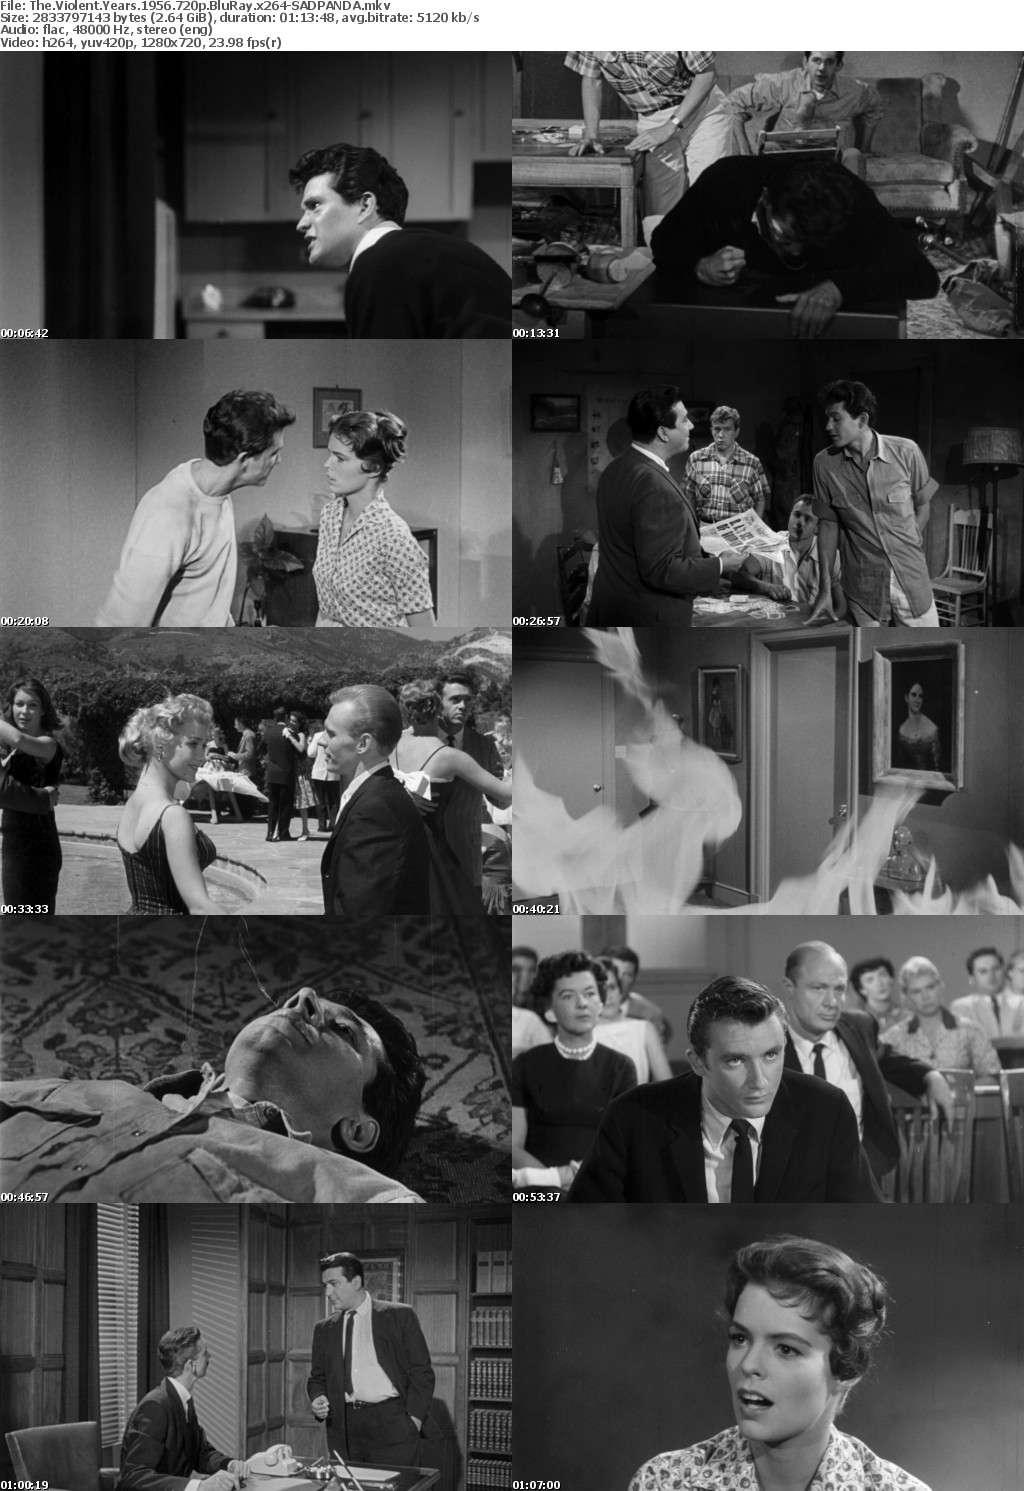 The Violent Years 1956 720p BluRay x264-SADPANDA